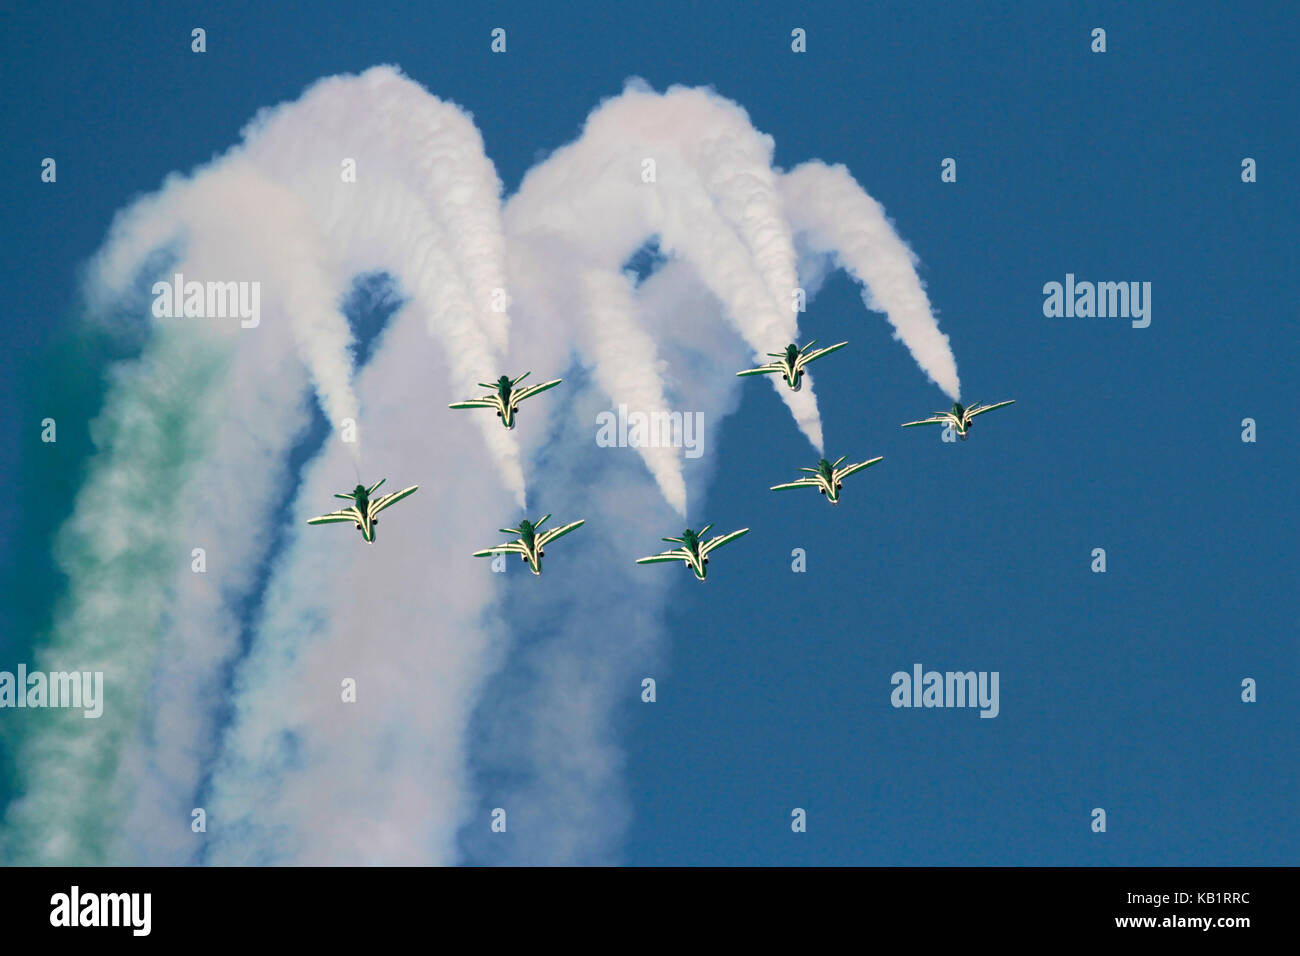 The Saudi Hawks aerobatic display team of the Royal Saudi Air Force performing a formation loop - Stock Image